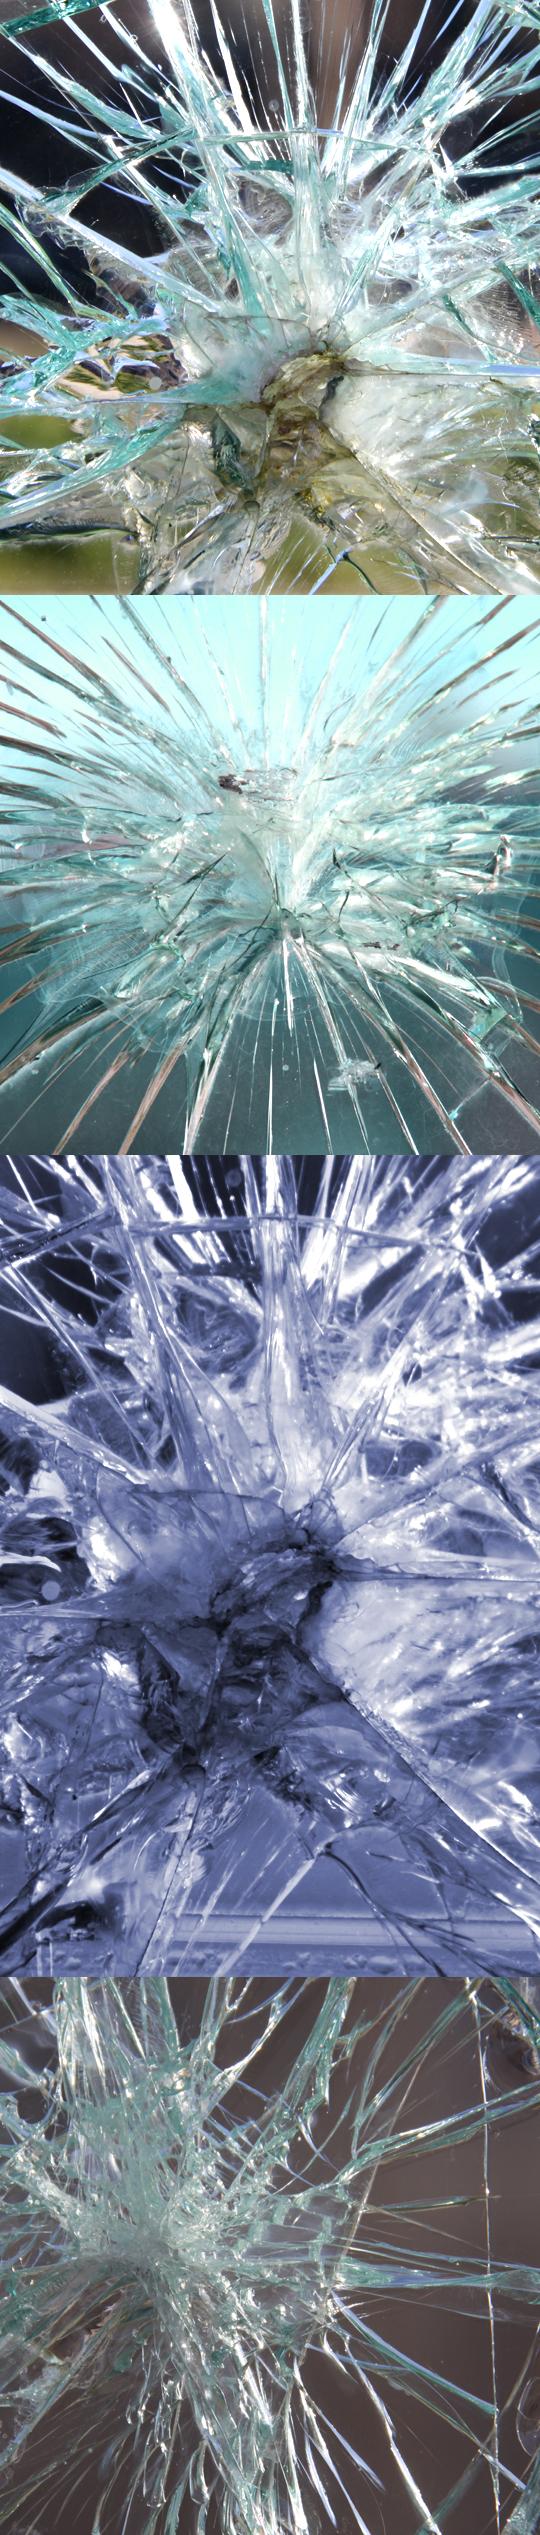 carlos diez-fotografo-fotografias-cristales-paisajes-interiores-3